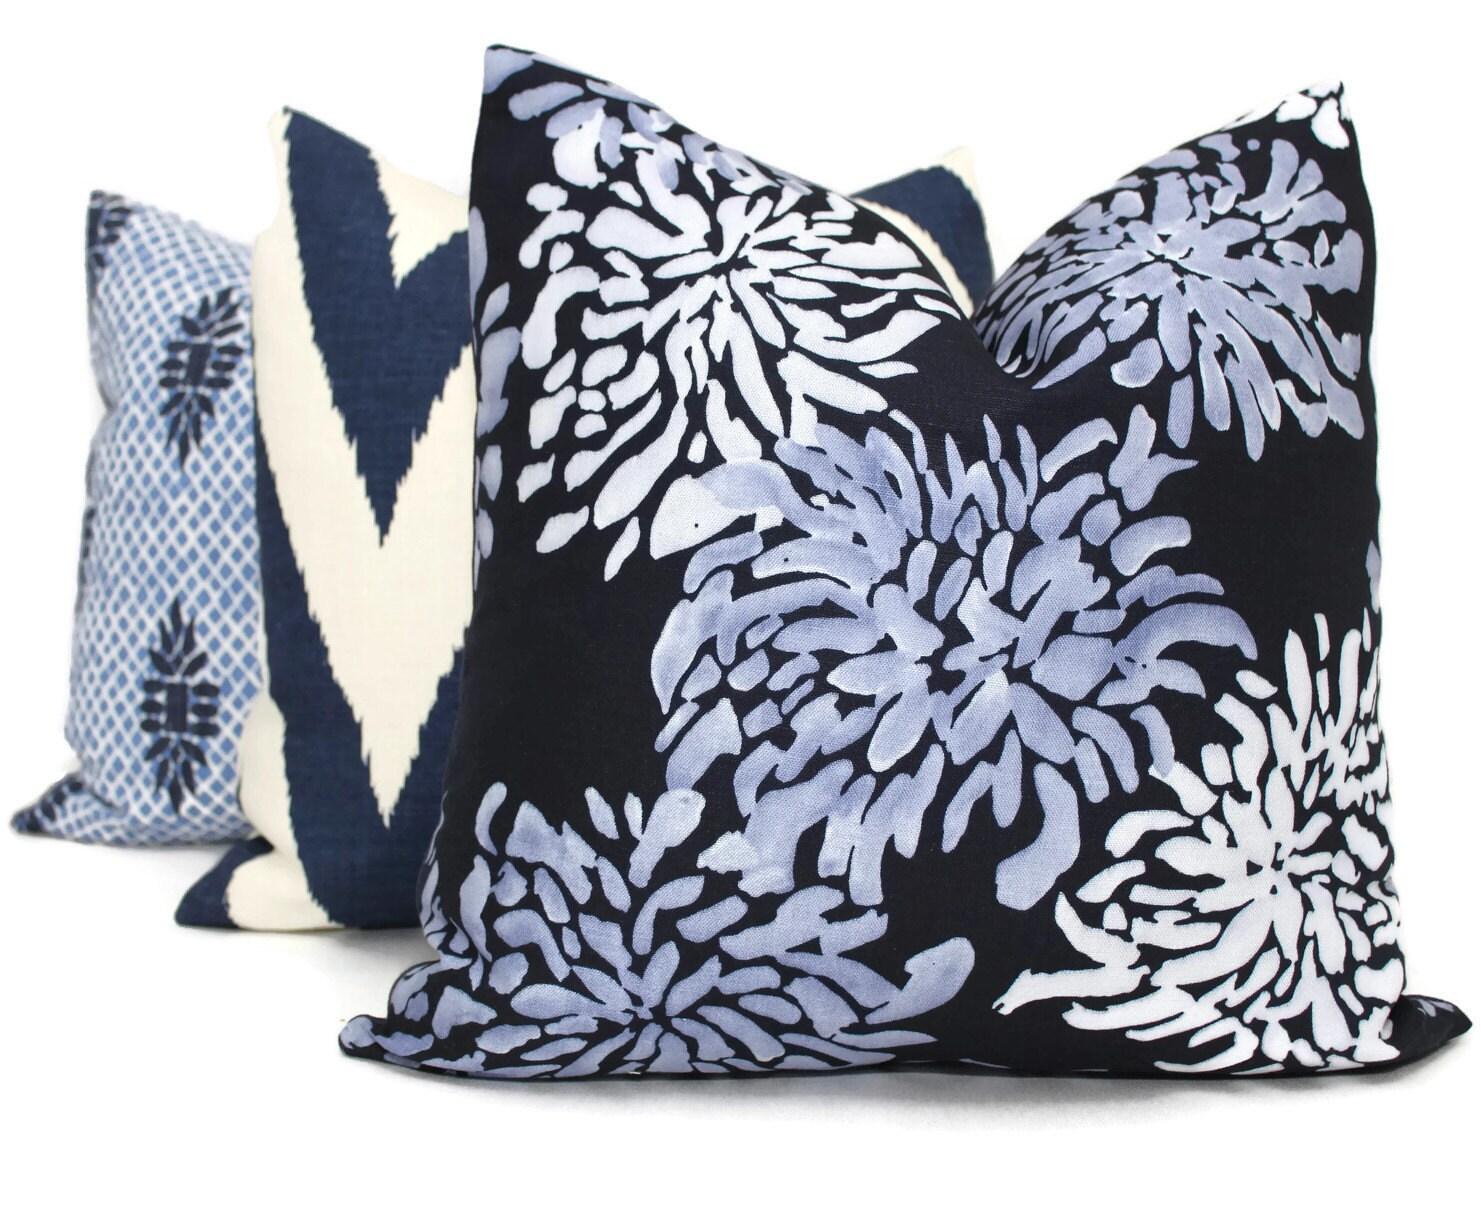 Decorative Pillows Indigo : Decorative Pillow Cover Indigo SeaCloth Mum Lee Jofa Pillow